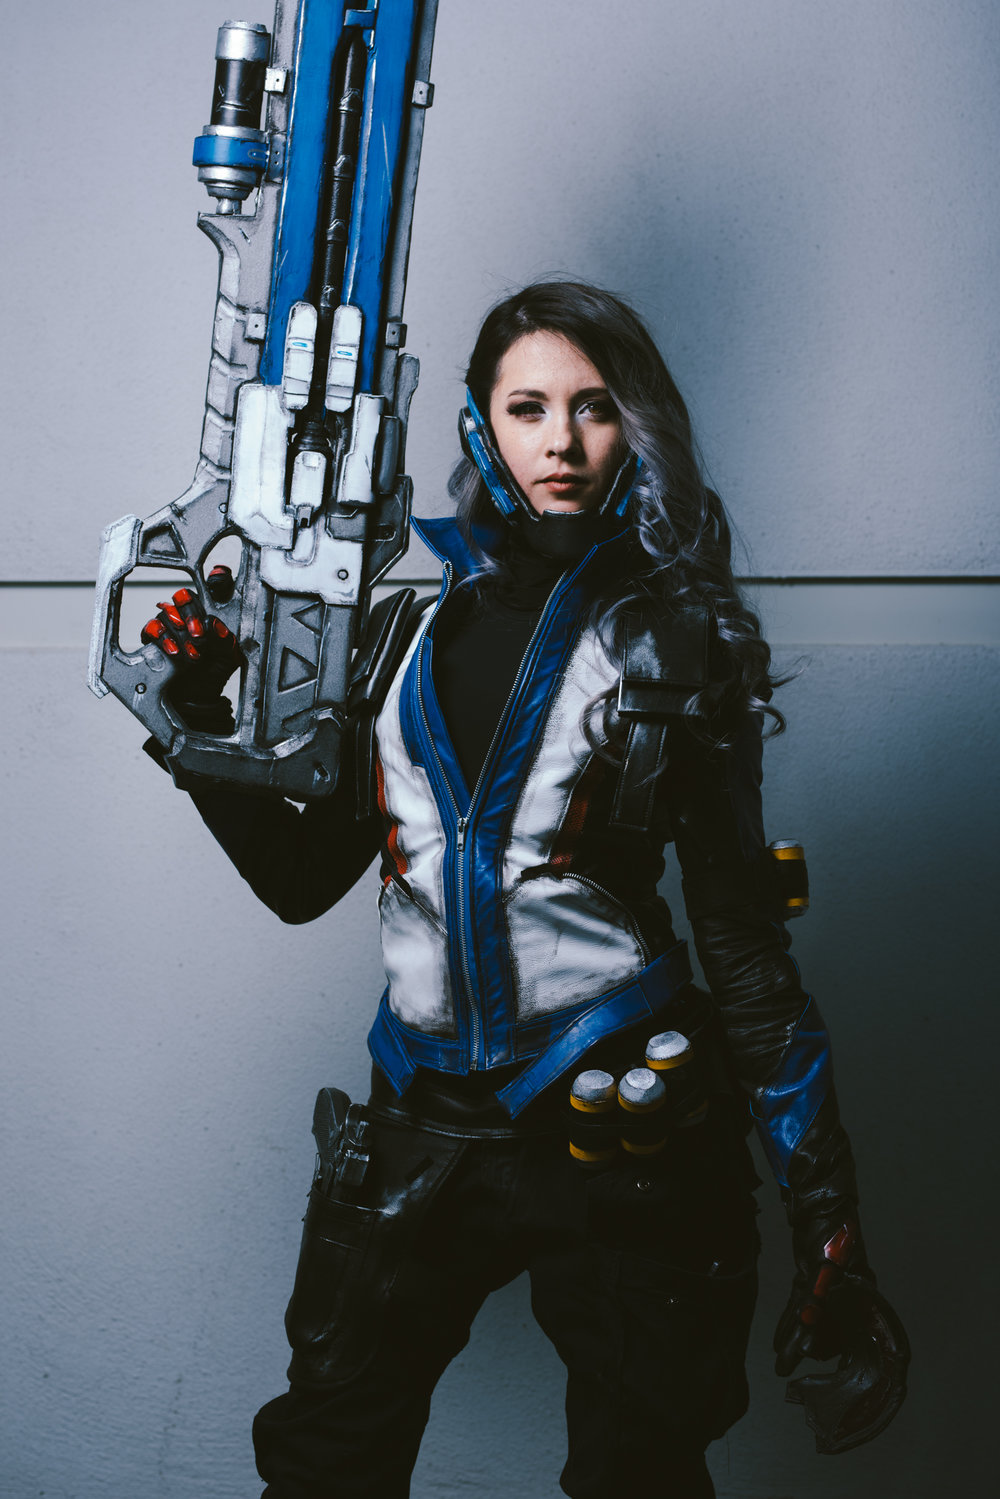 cosplay_ow05.jpg